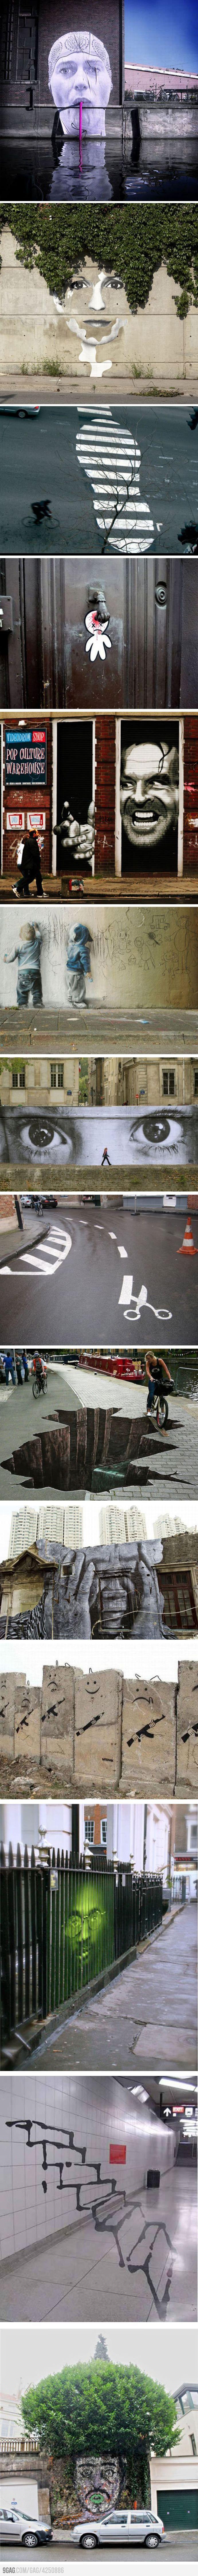 City art at its best